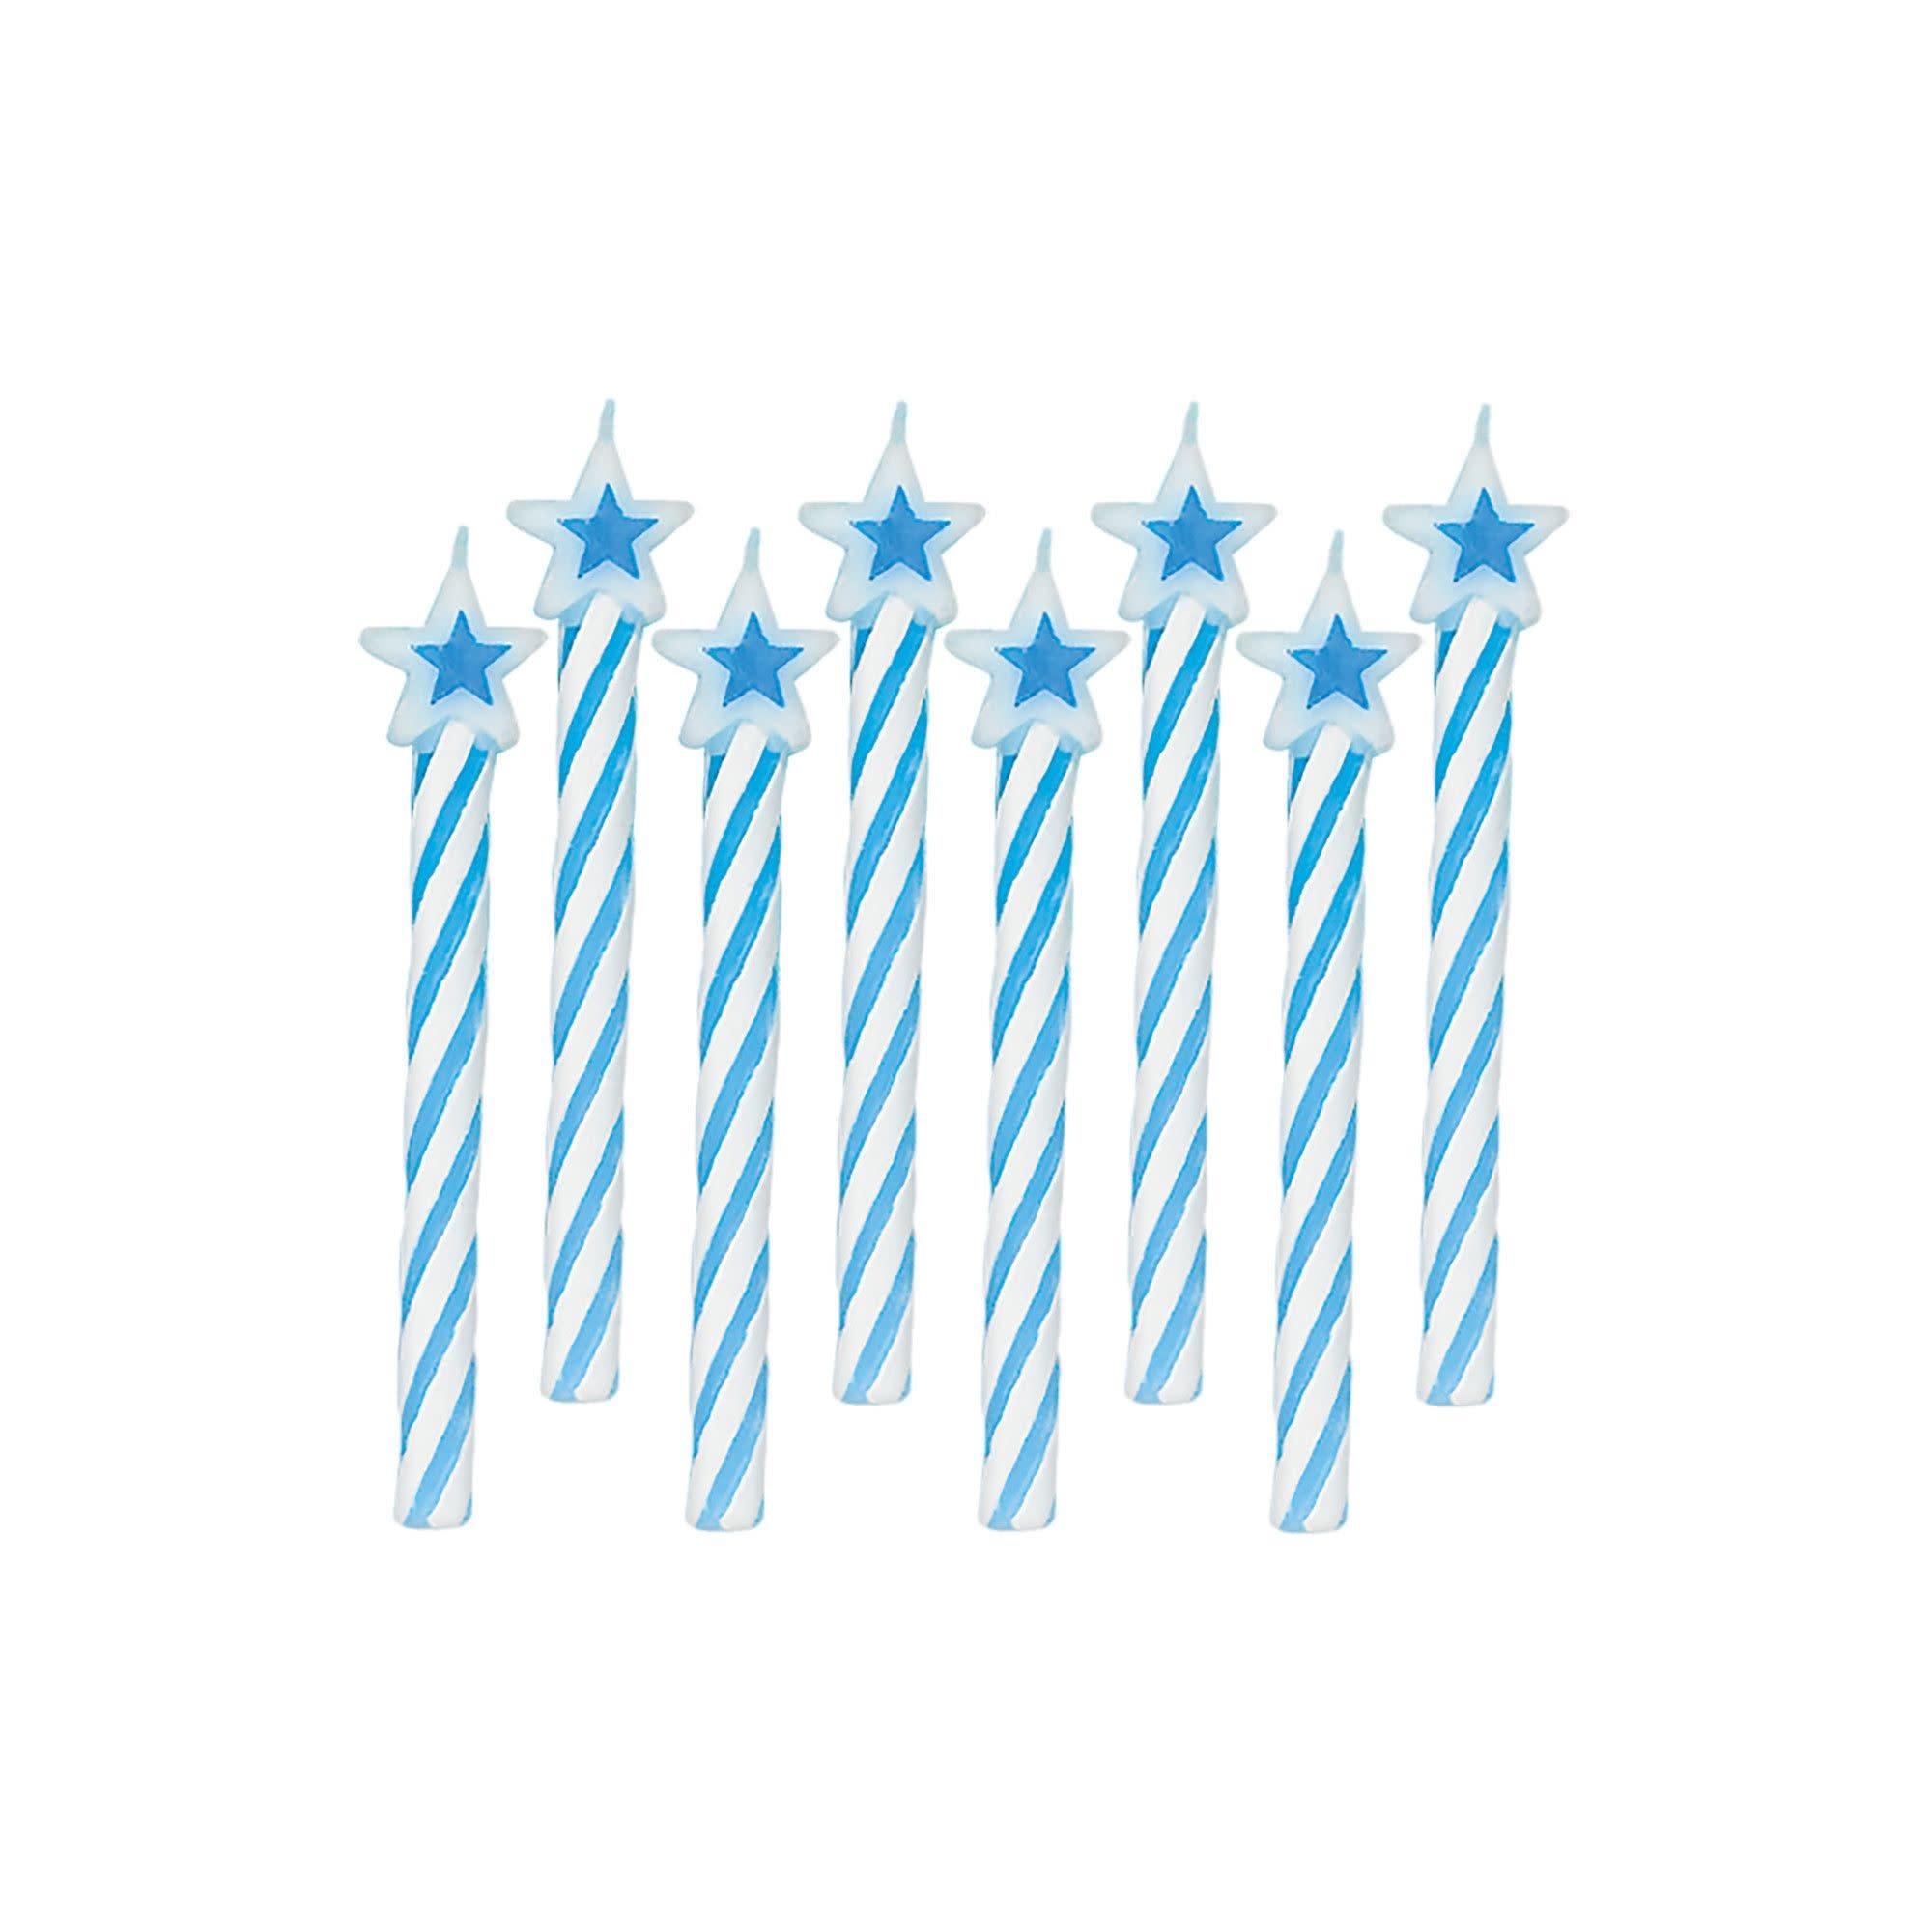 Spiral Candles W/Star Topper - Blue